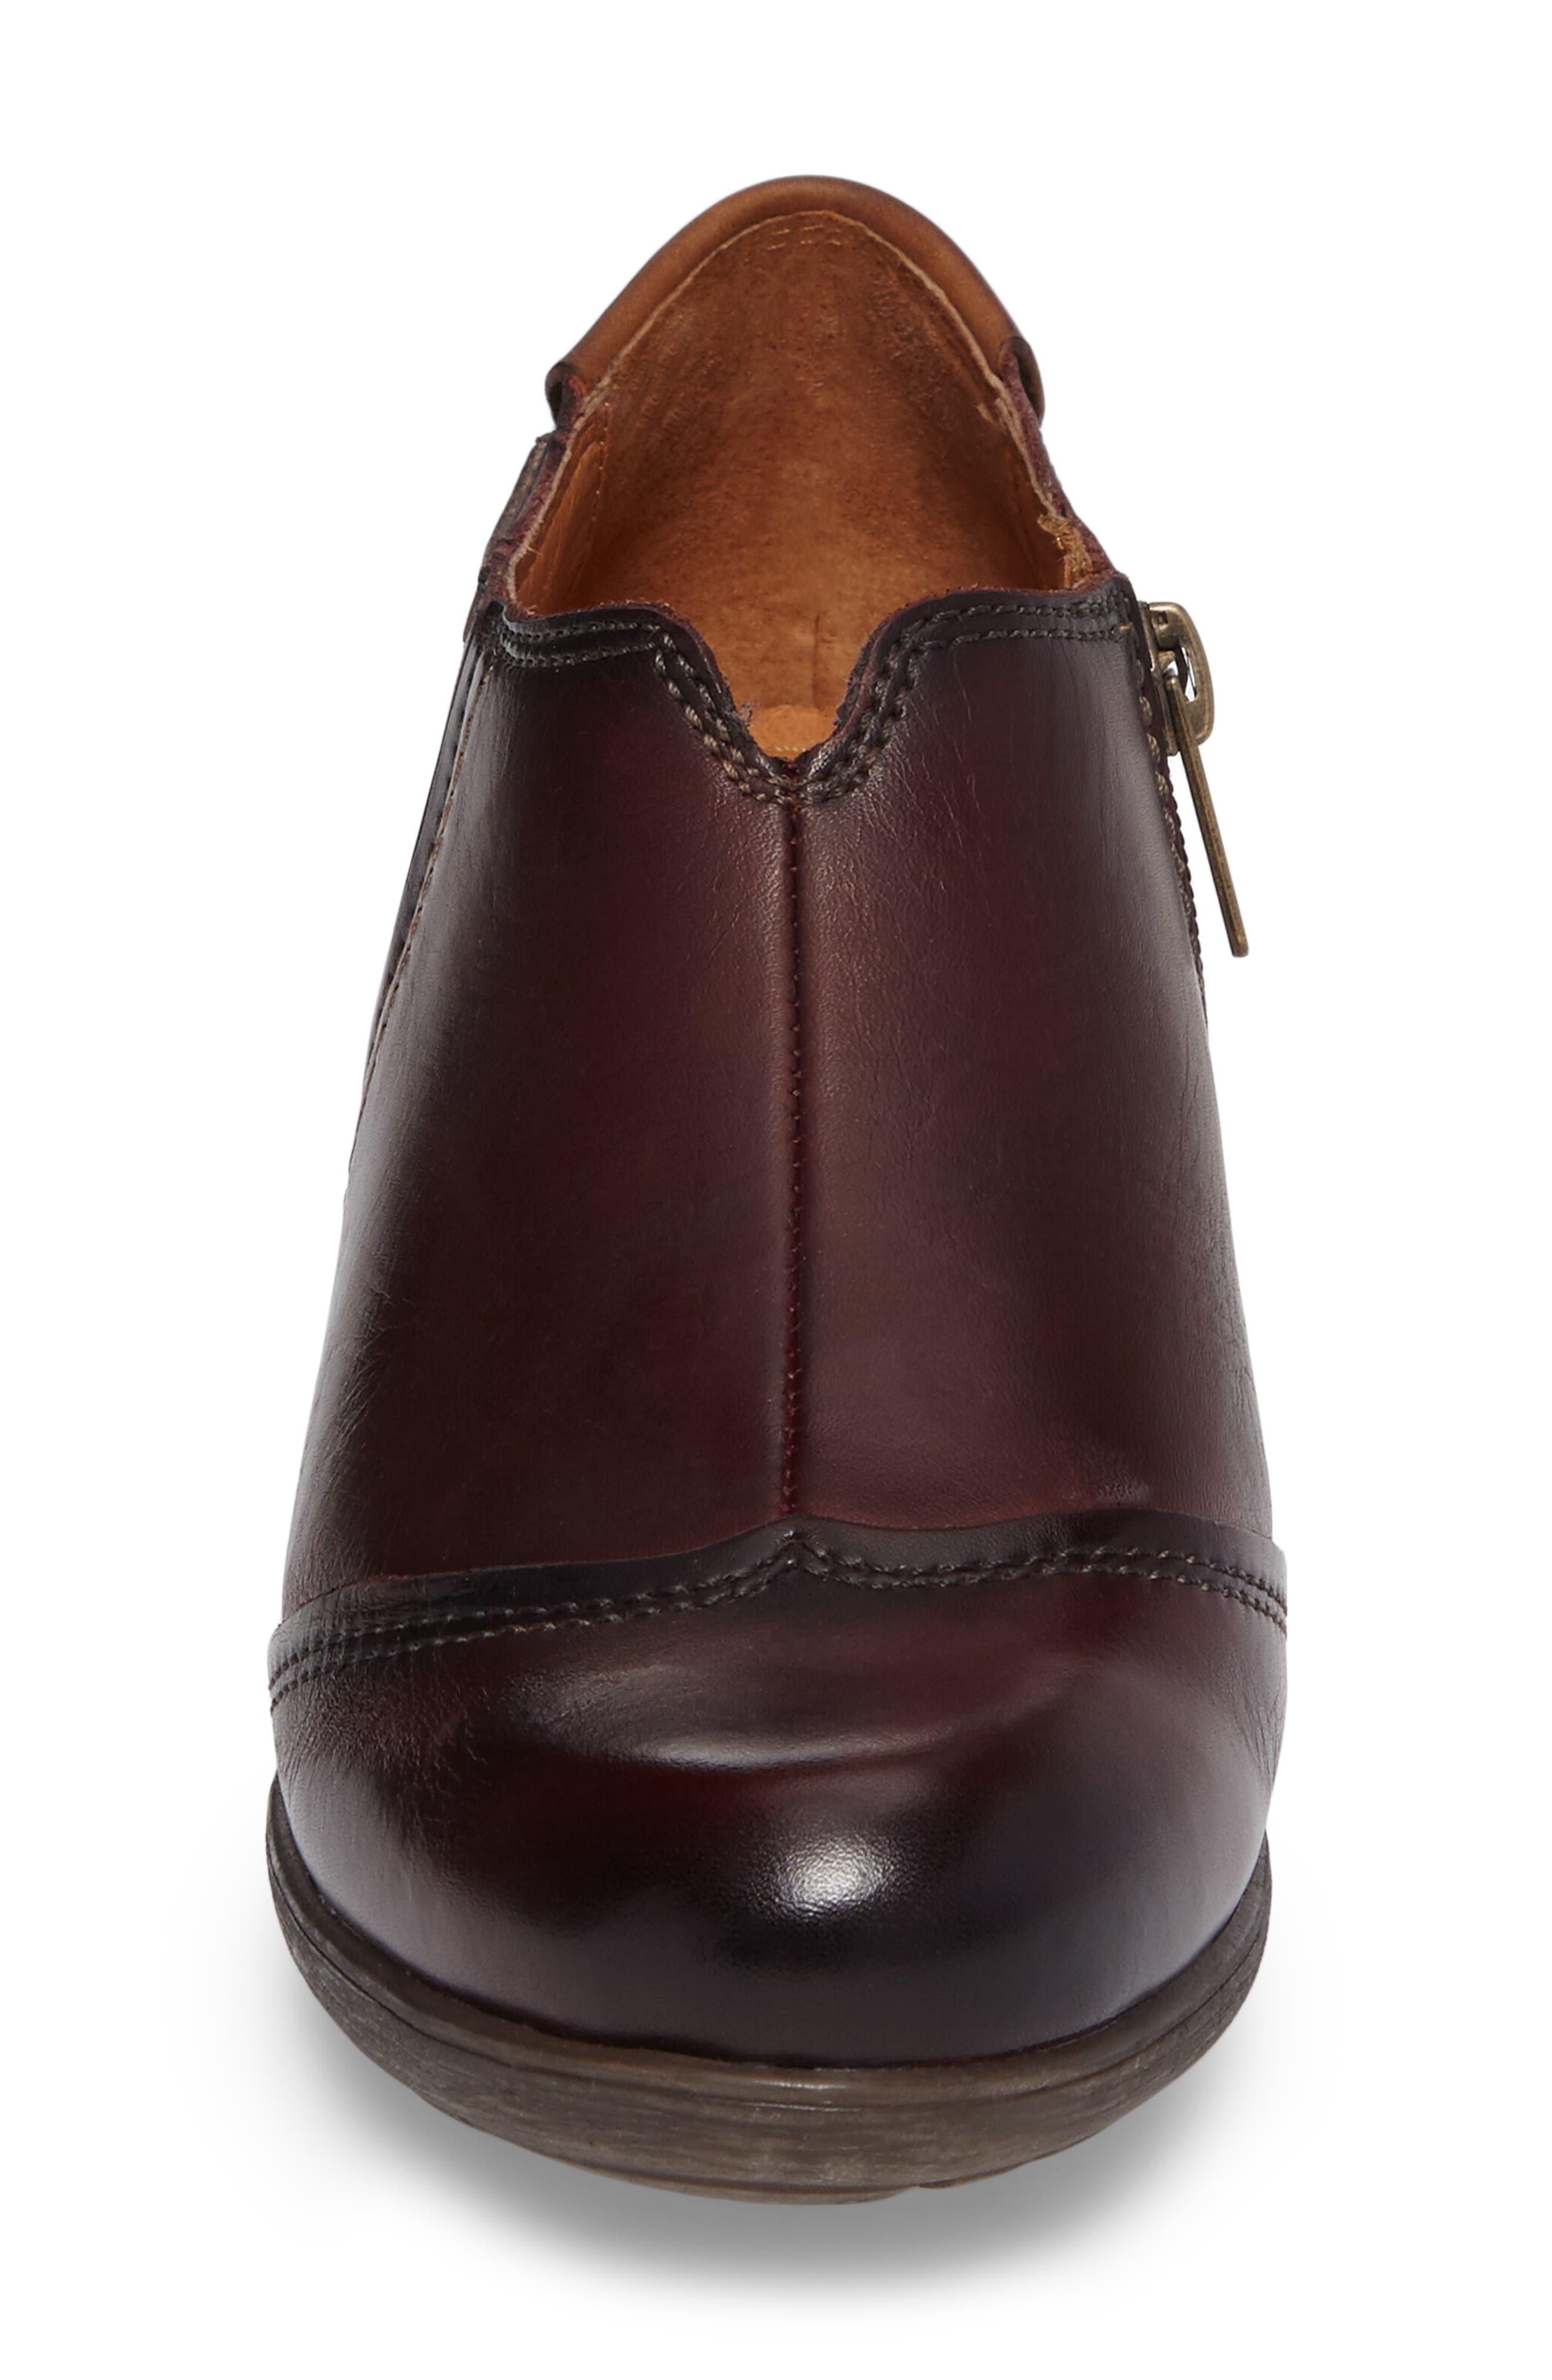 Rotterdam Bootie,                             Alternate thumbnail 4, color,                             Garnet Cuero Leather